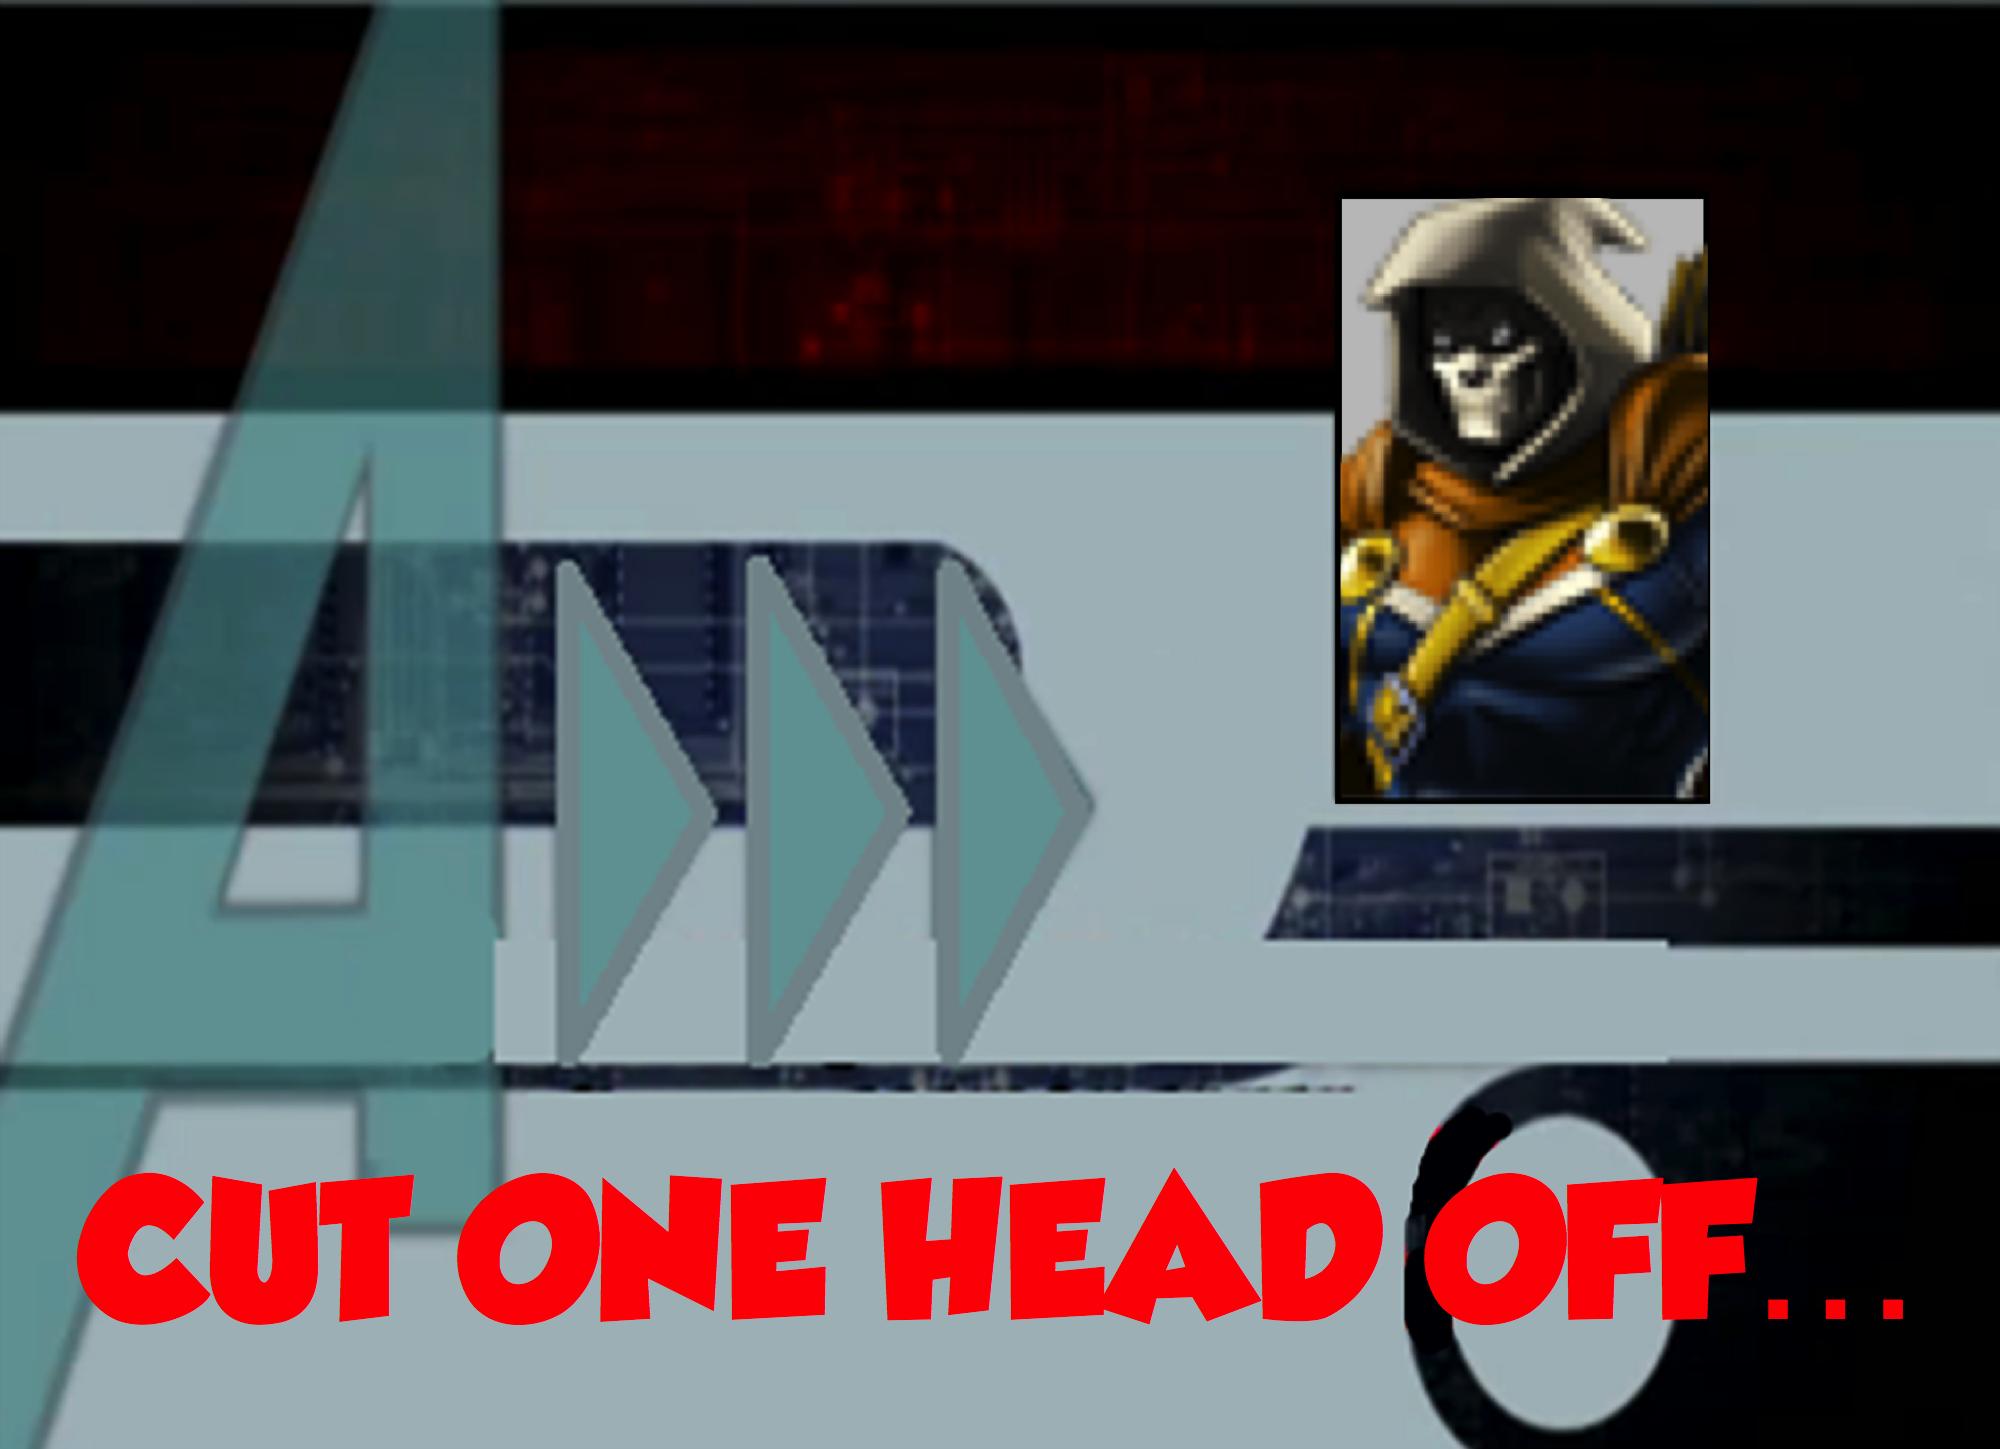 Cut One Head Off... (A!)